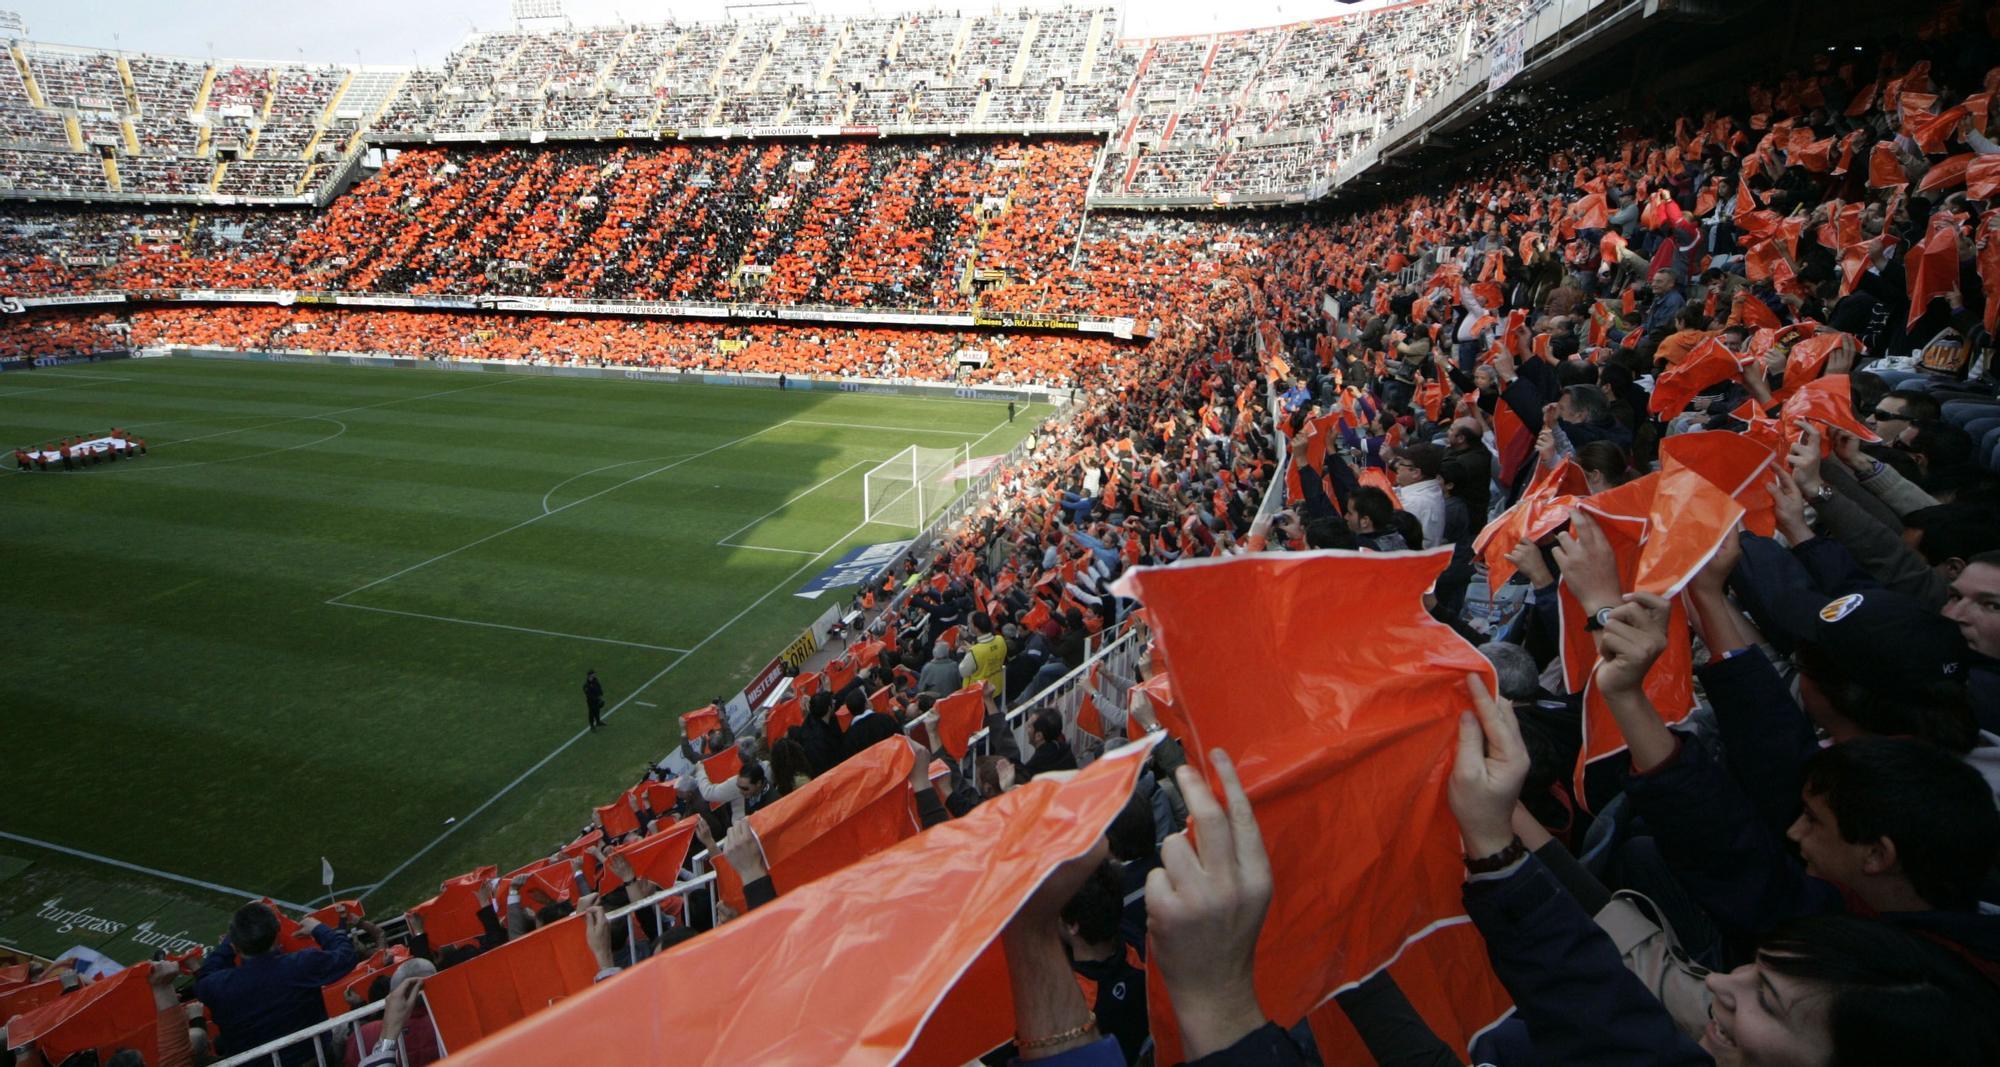 Históricos momentos mágicos de la grada de  Mestalla que pronto volverán